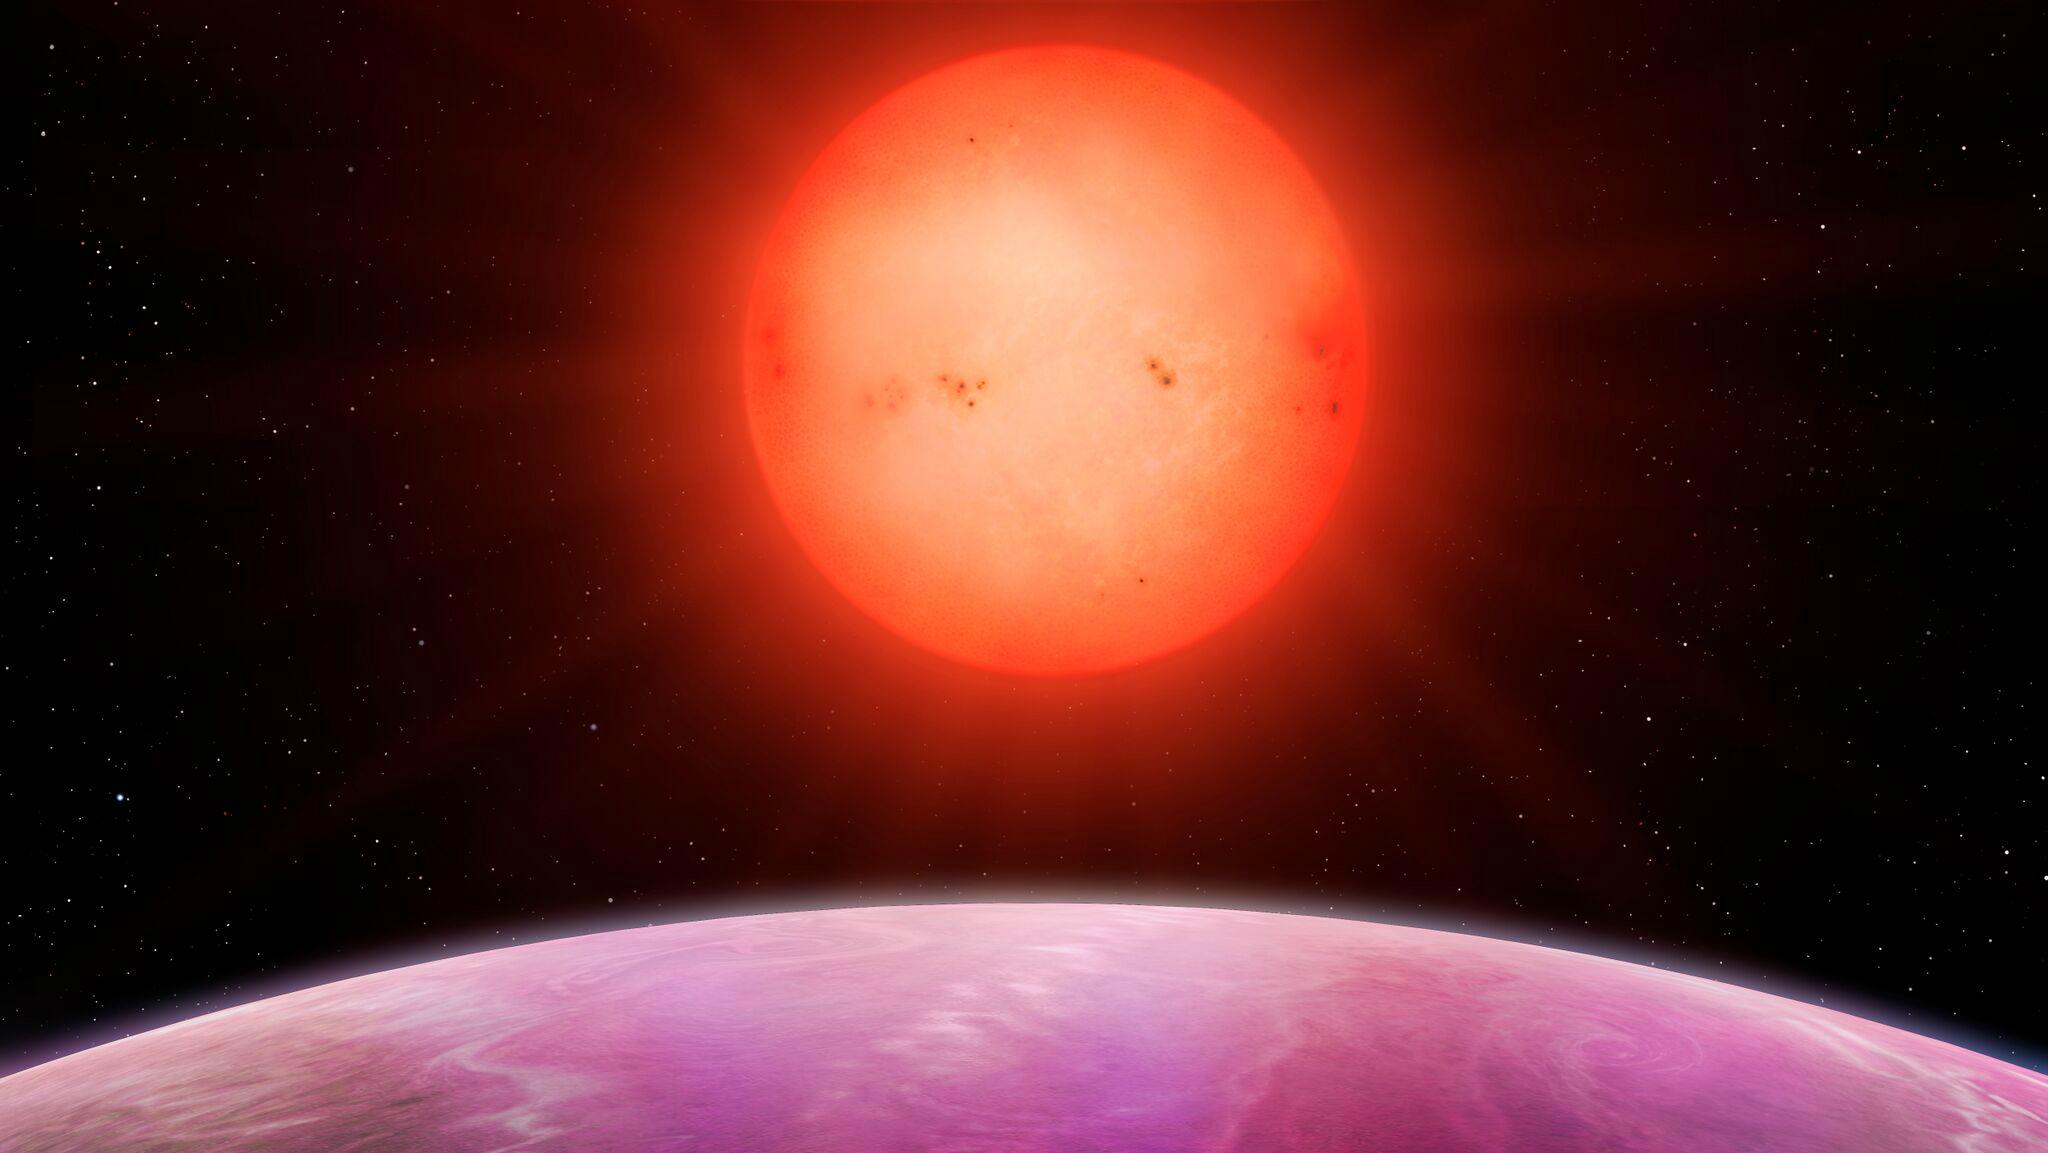 Big planet. Small star.